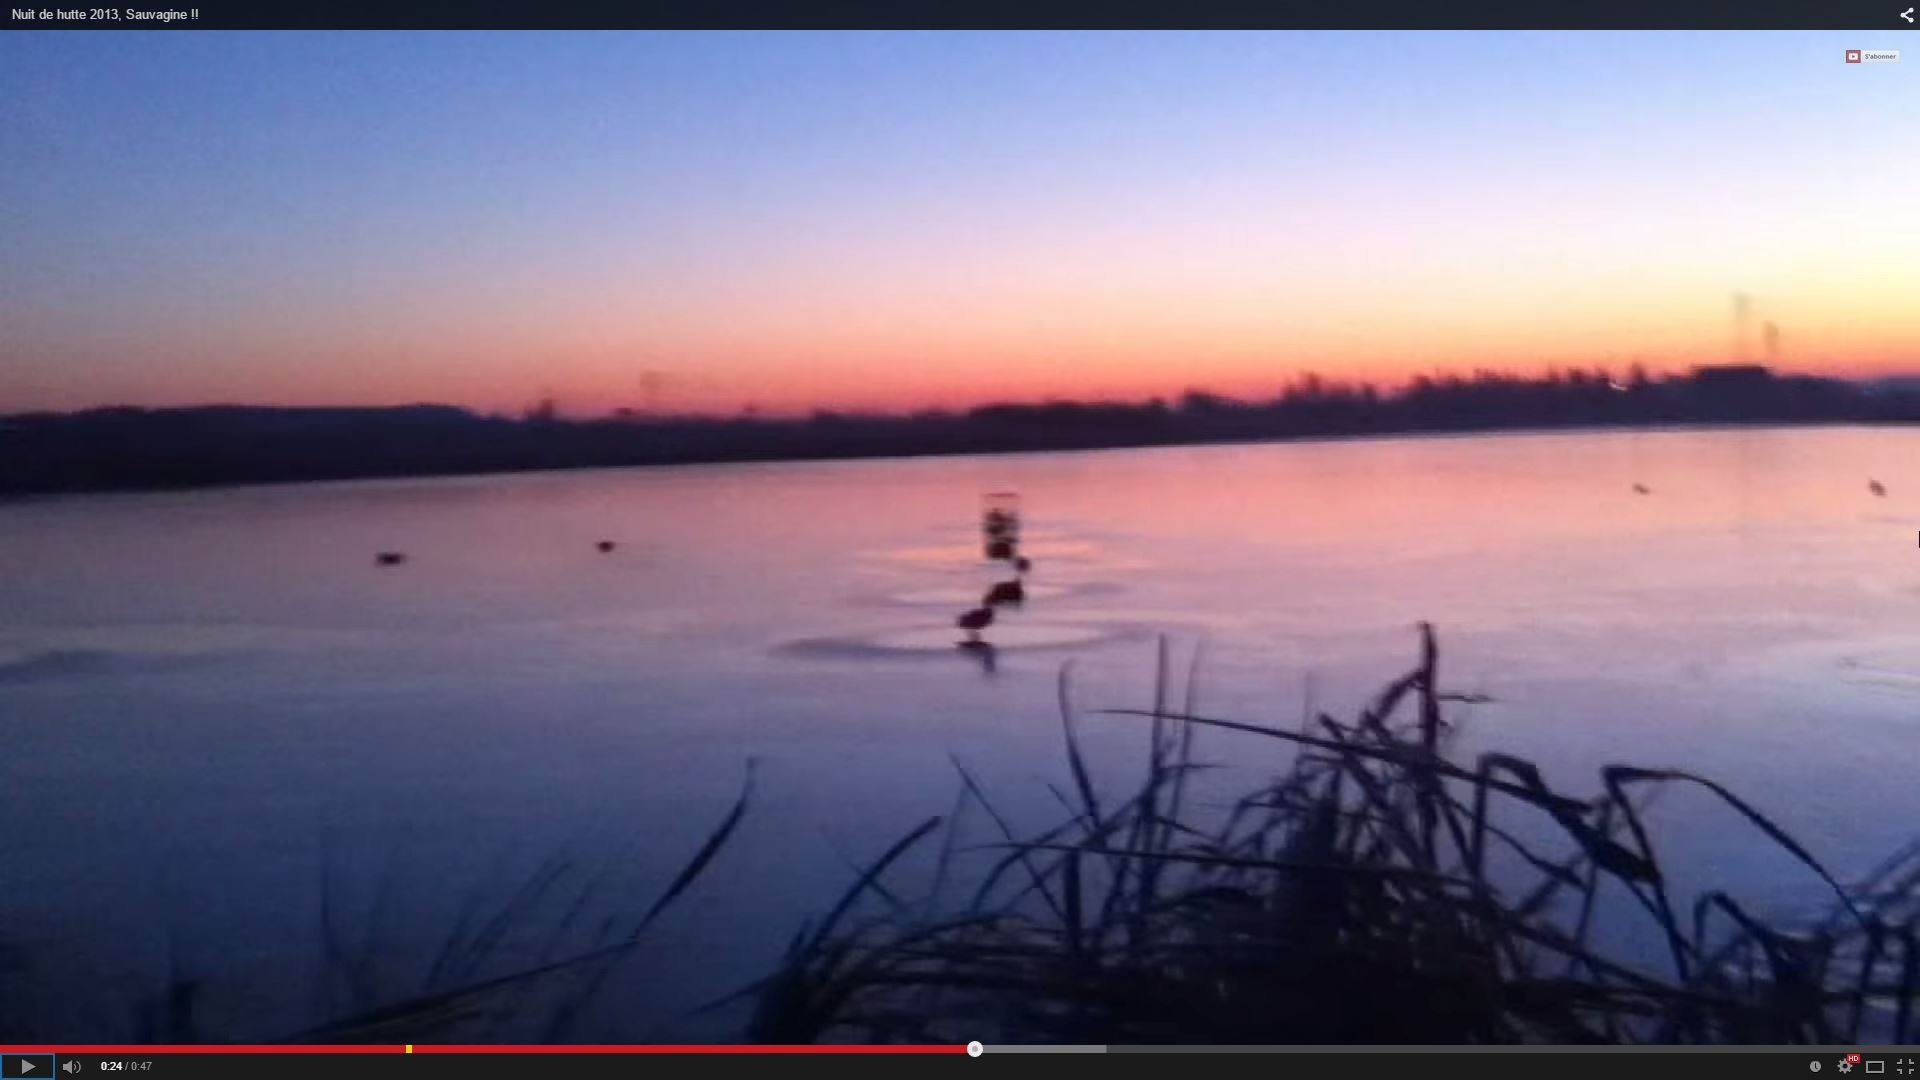 2015-02-11 10_21_50-Nuit de hutte 2013, Sauvagine !! - YouTube